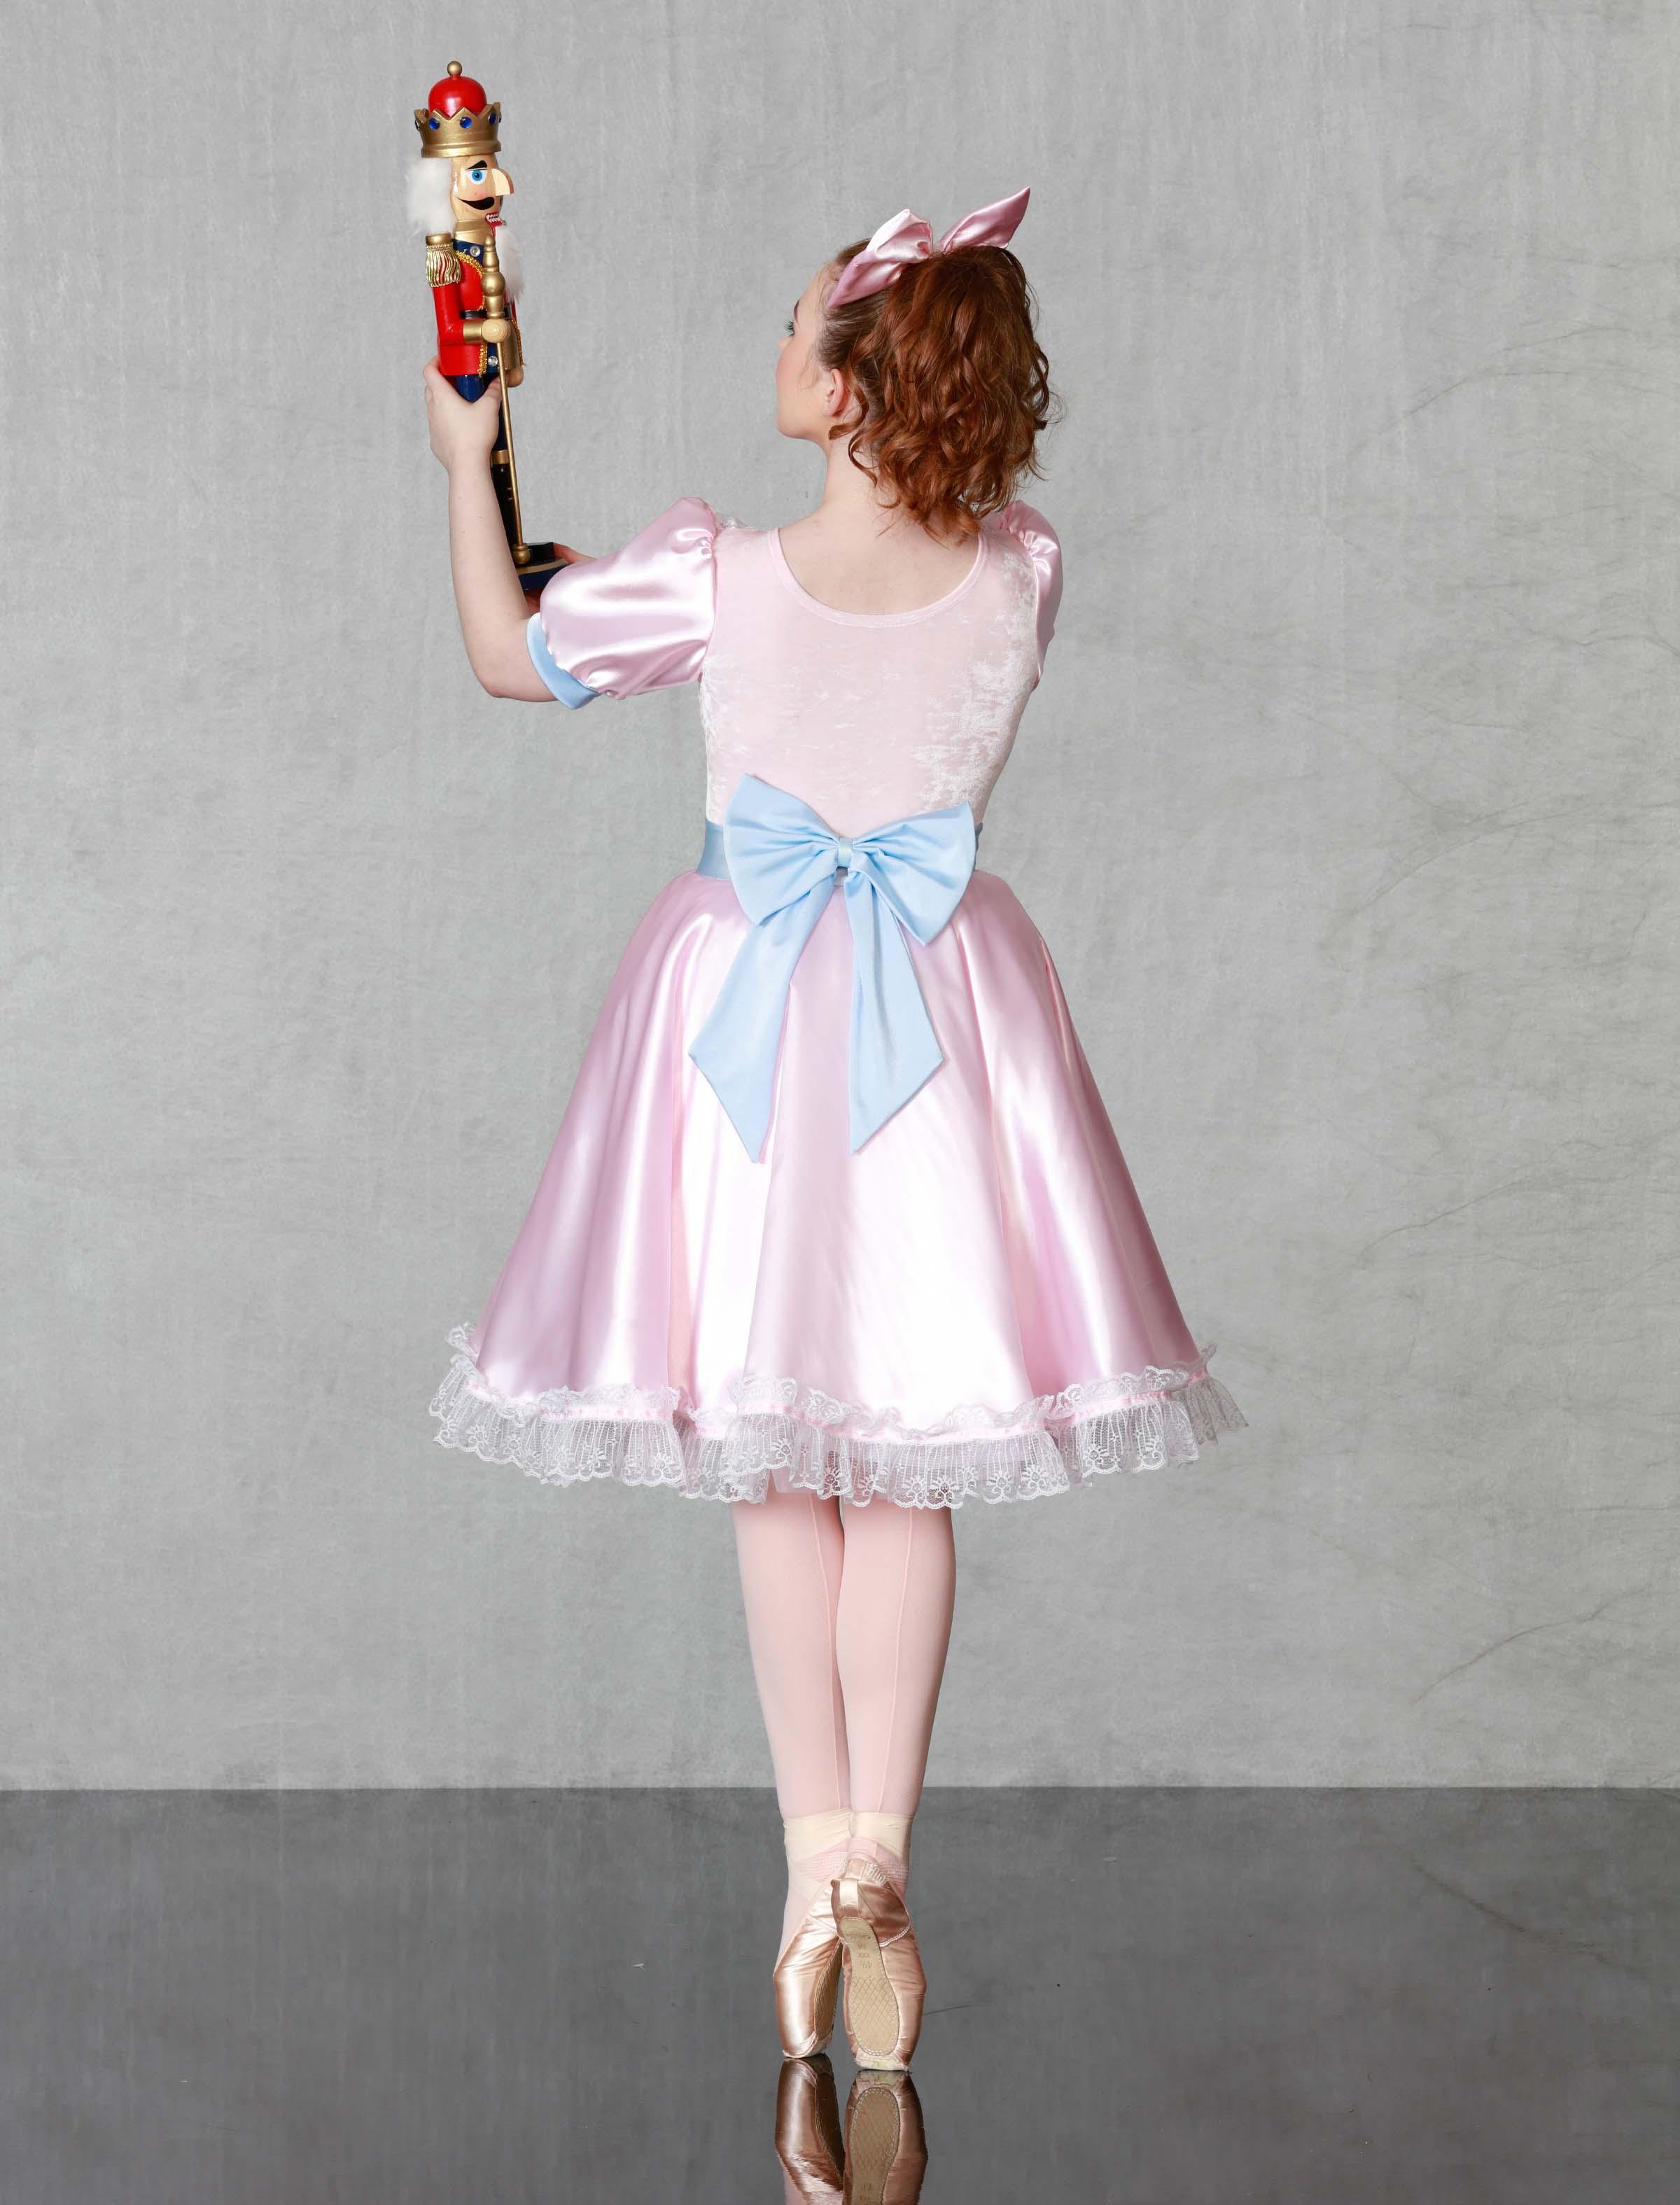 Georgie Girl Costumes - NUTCRACKER CHANTILLY CLARA